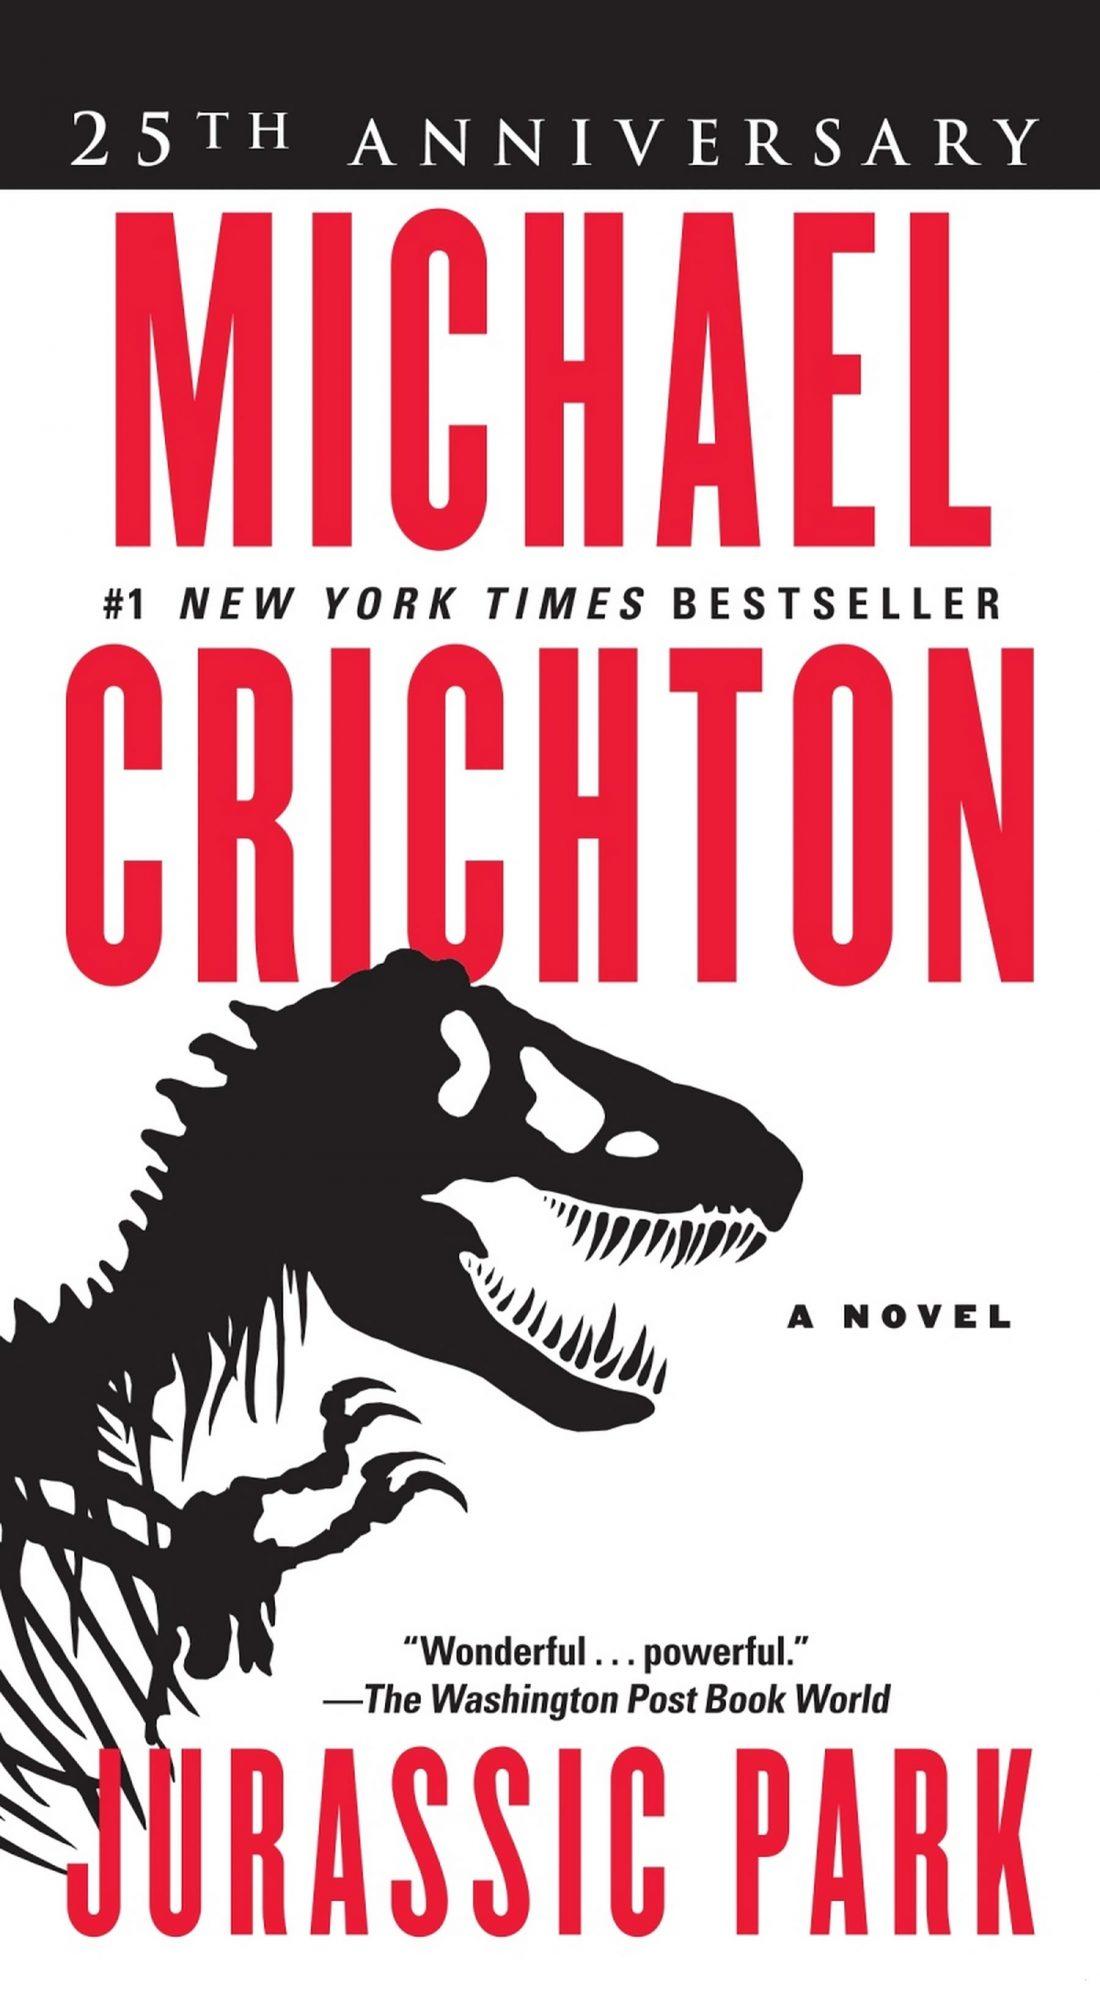 Jurassic Park by Michael Crichton CR: Ballantine